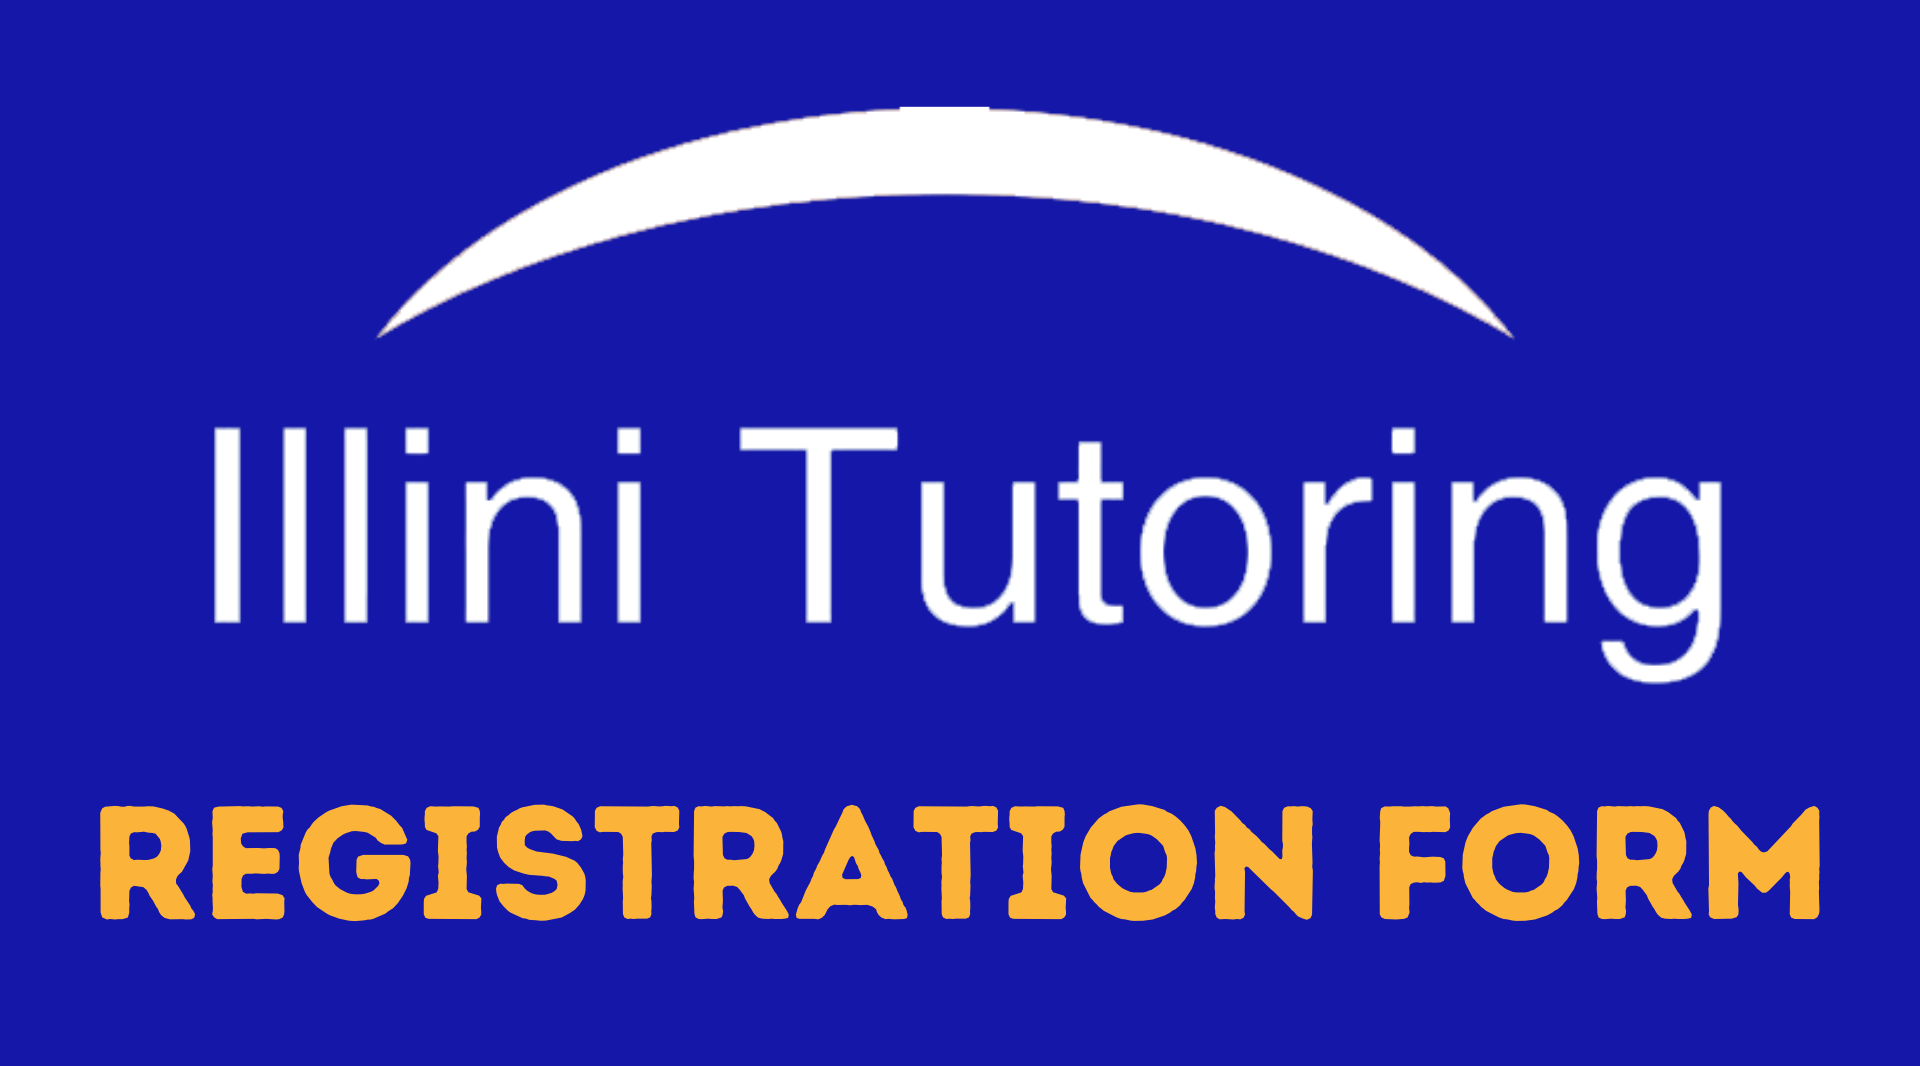 Illini Tutoring Registration Form